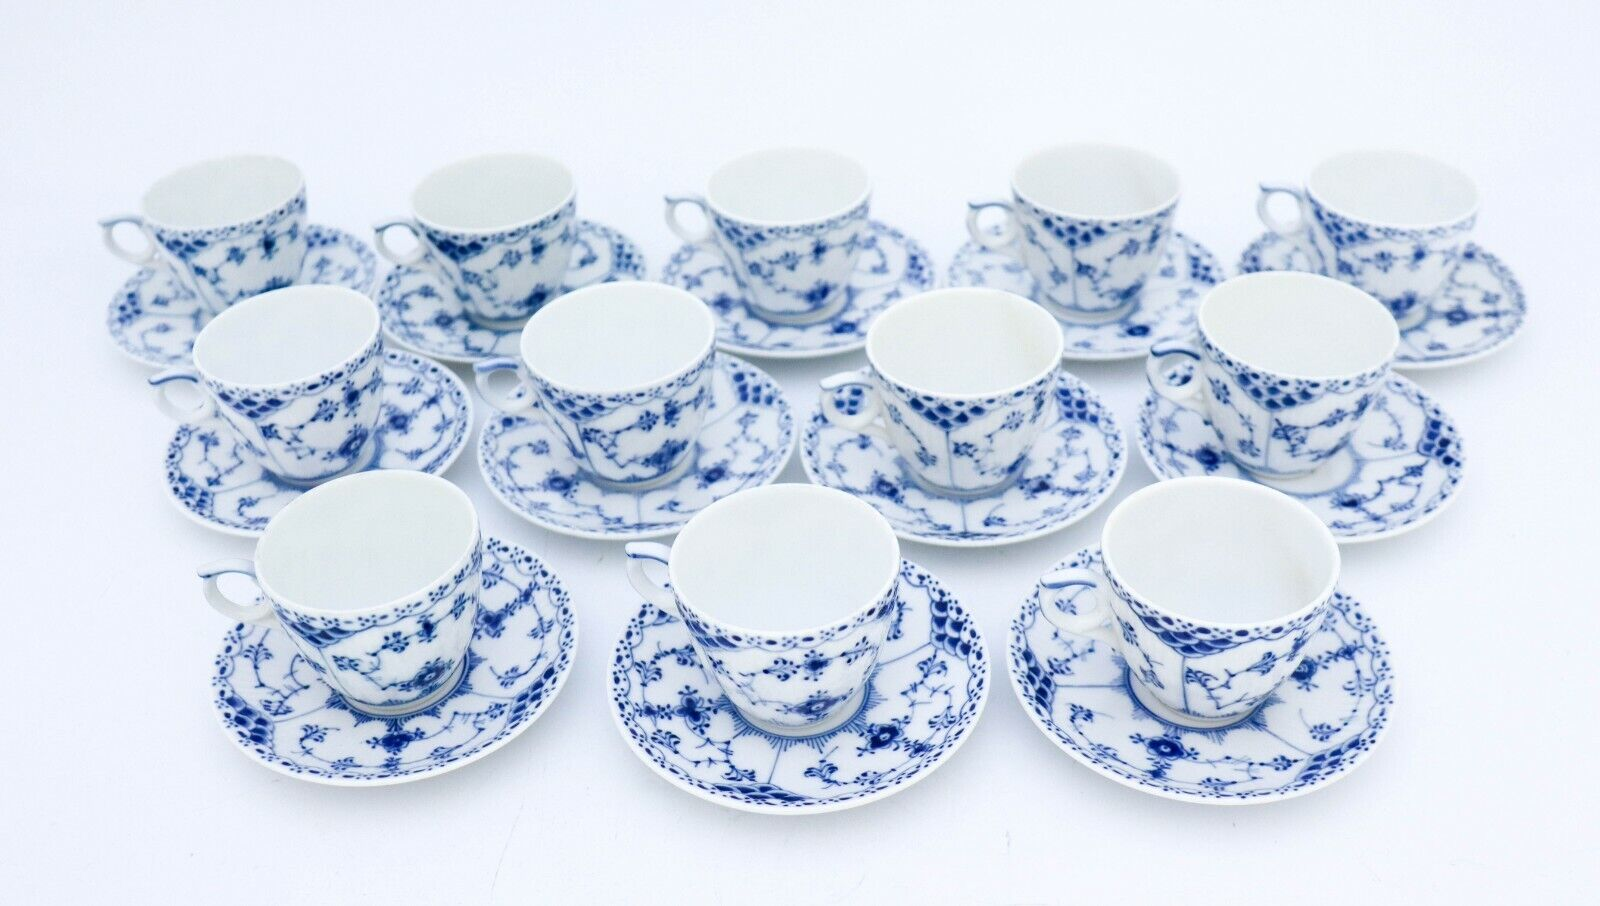 Image 1 - 12 Cups & Saucers #528 - Blue Fluted Royal Copenhagen - Half Lace - 1:st Quality